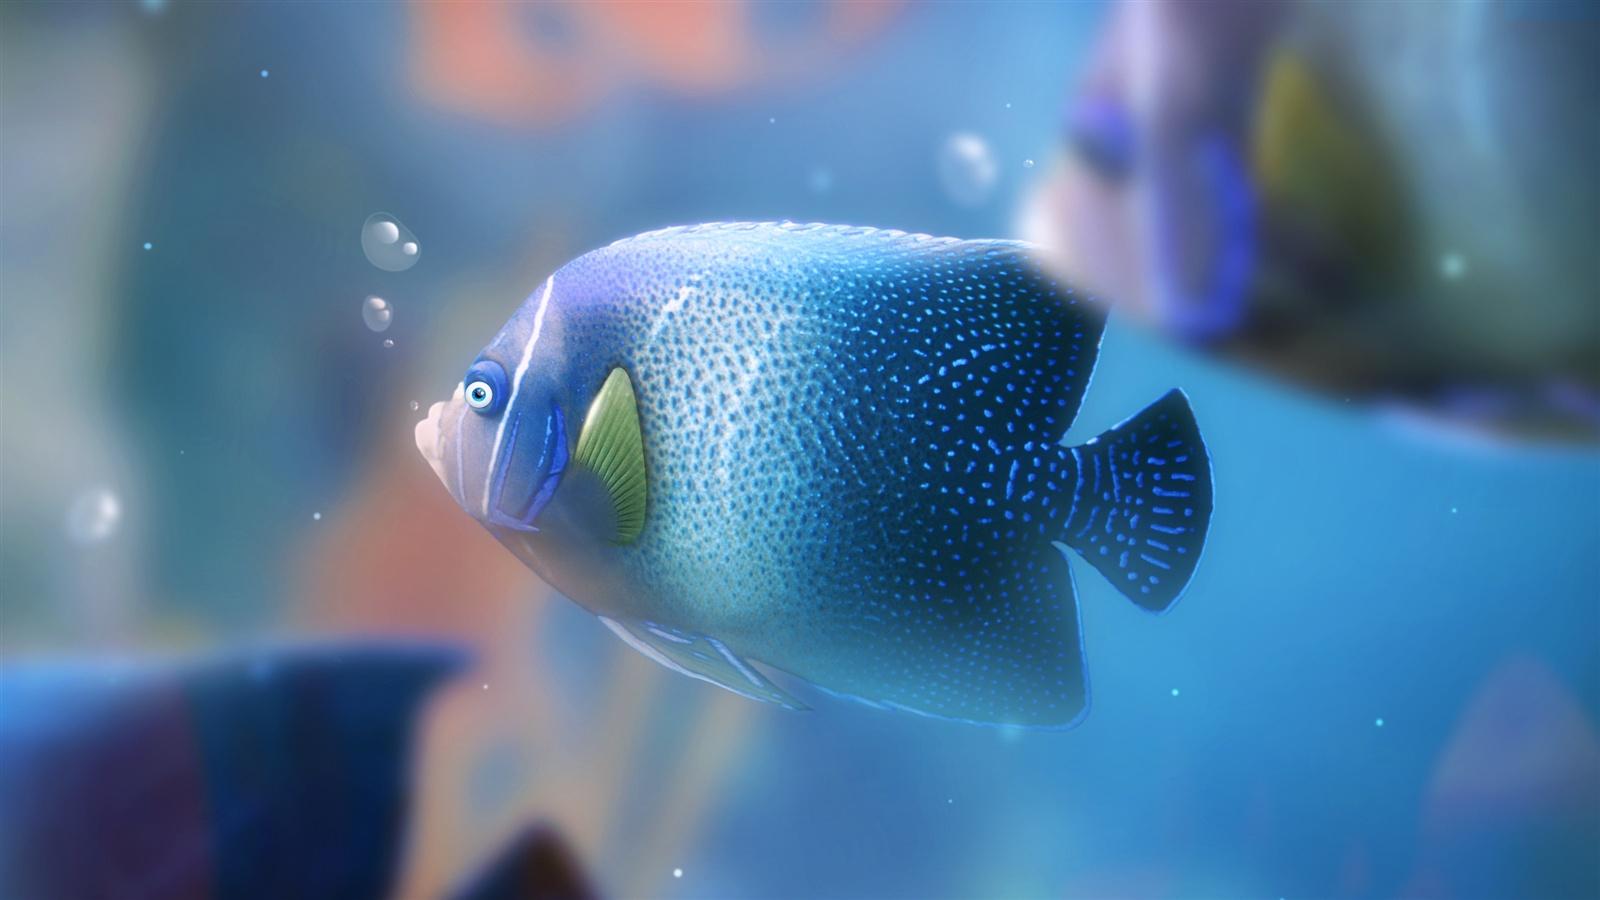 Blue Aquarium Fish Wallpaper 1600x900 Resolution